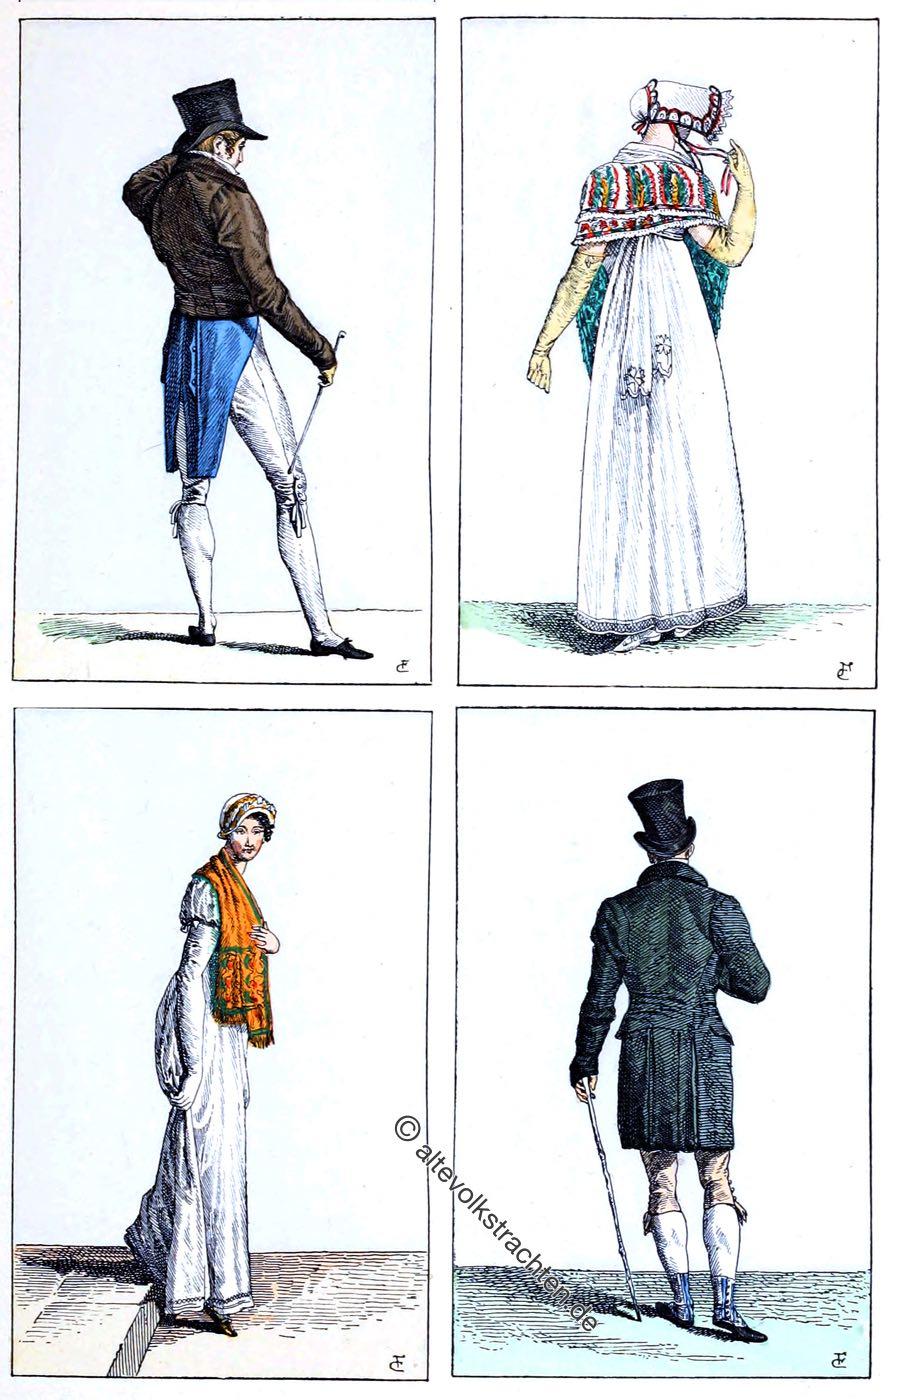 Merveilleux, Incroyable, Empire, Mode, Kostüme, Henri Bouchot